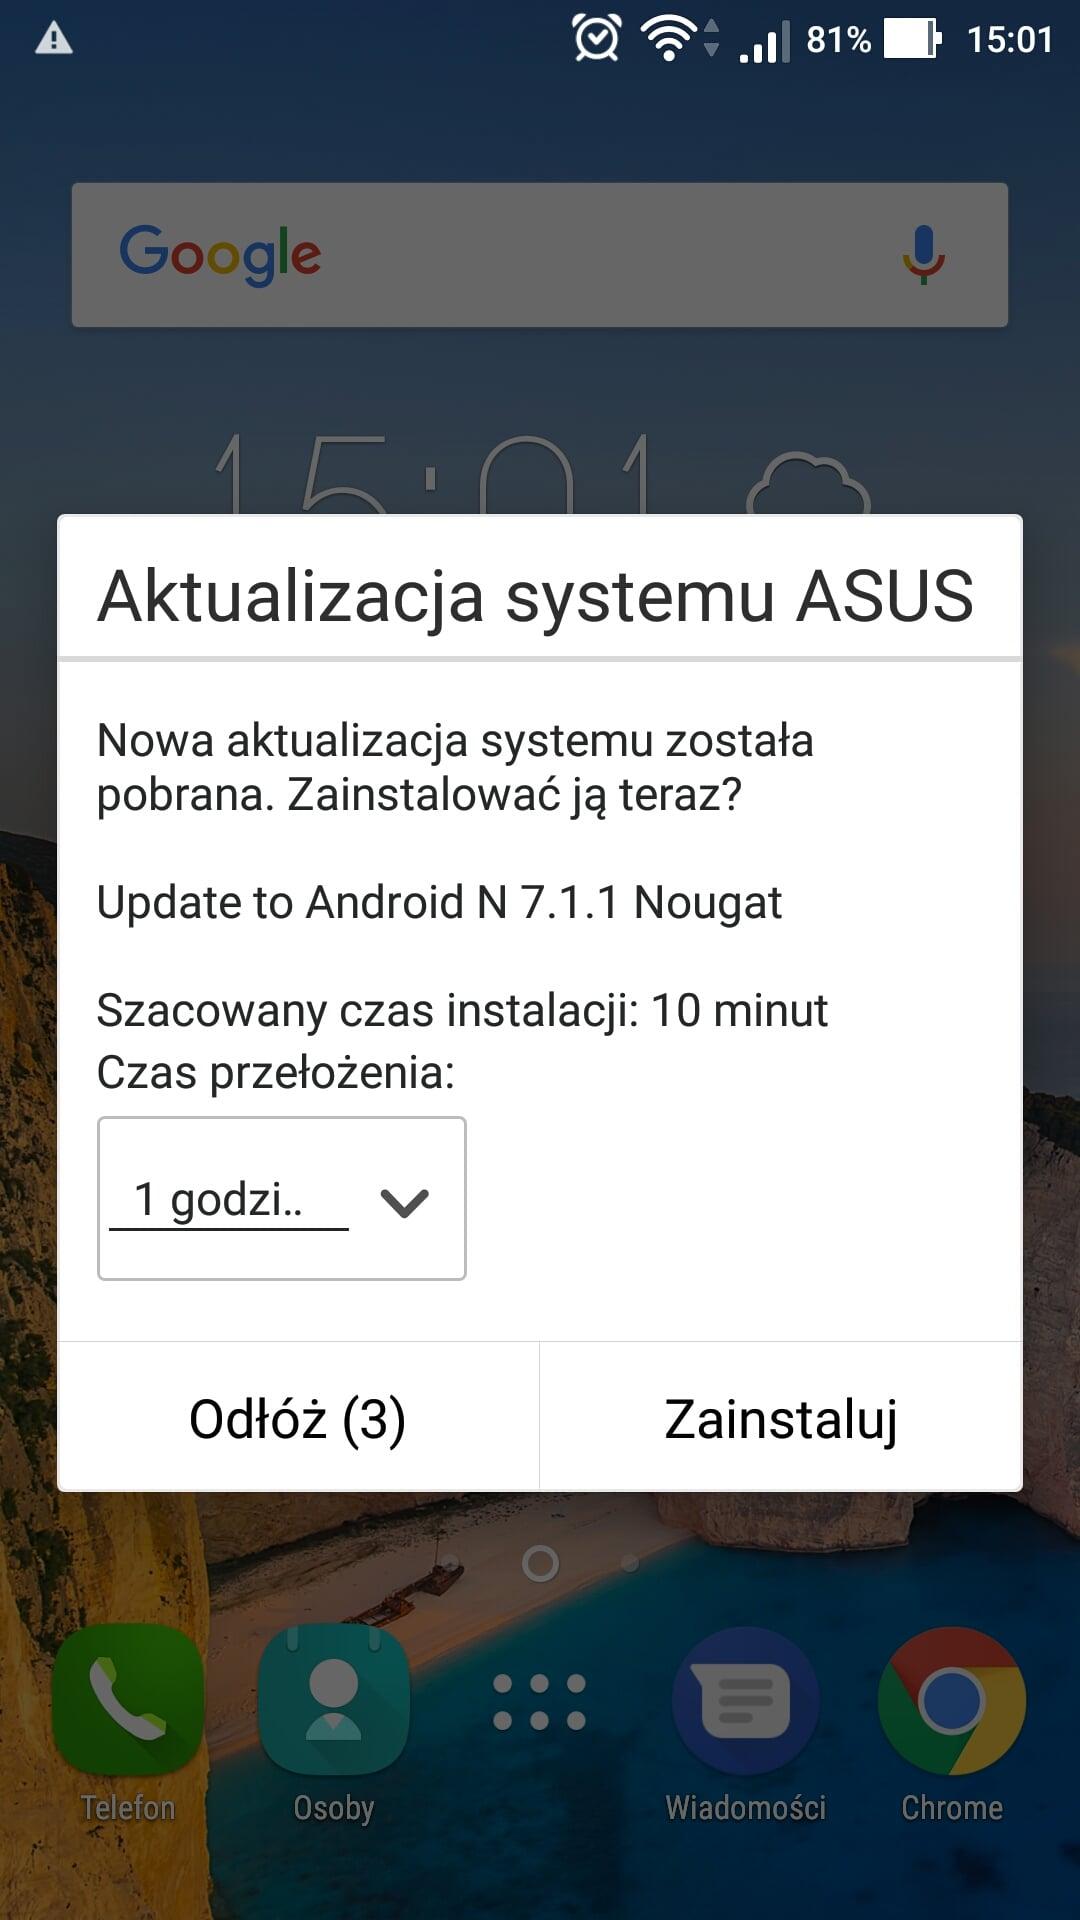 Asus udostępnia Androida 7.1.1 Nougat dla modelu Zenfone 3 Max (ZC553KL) 19